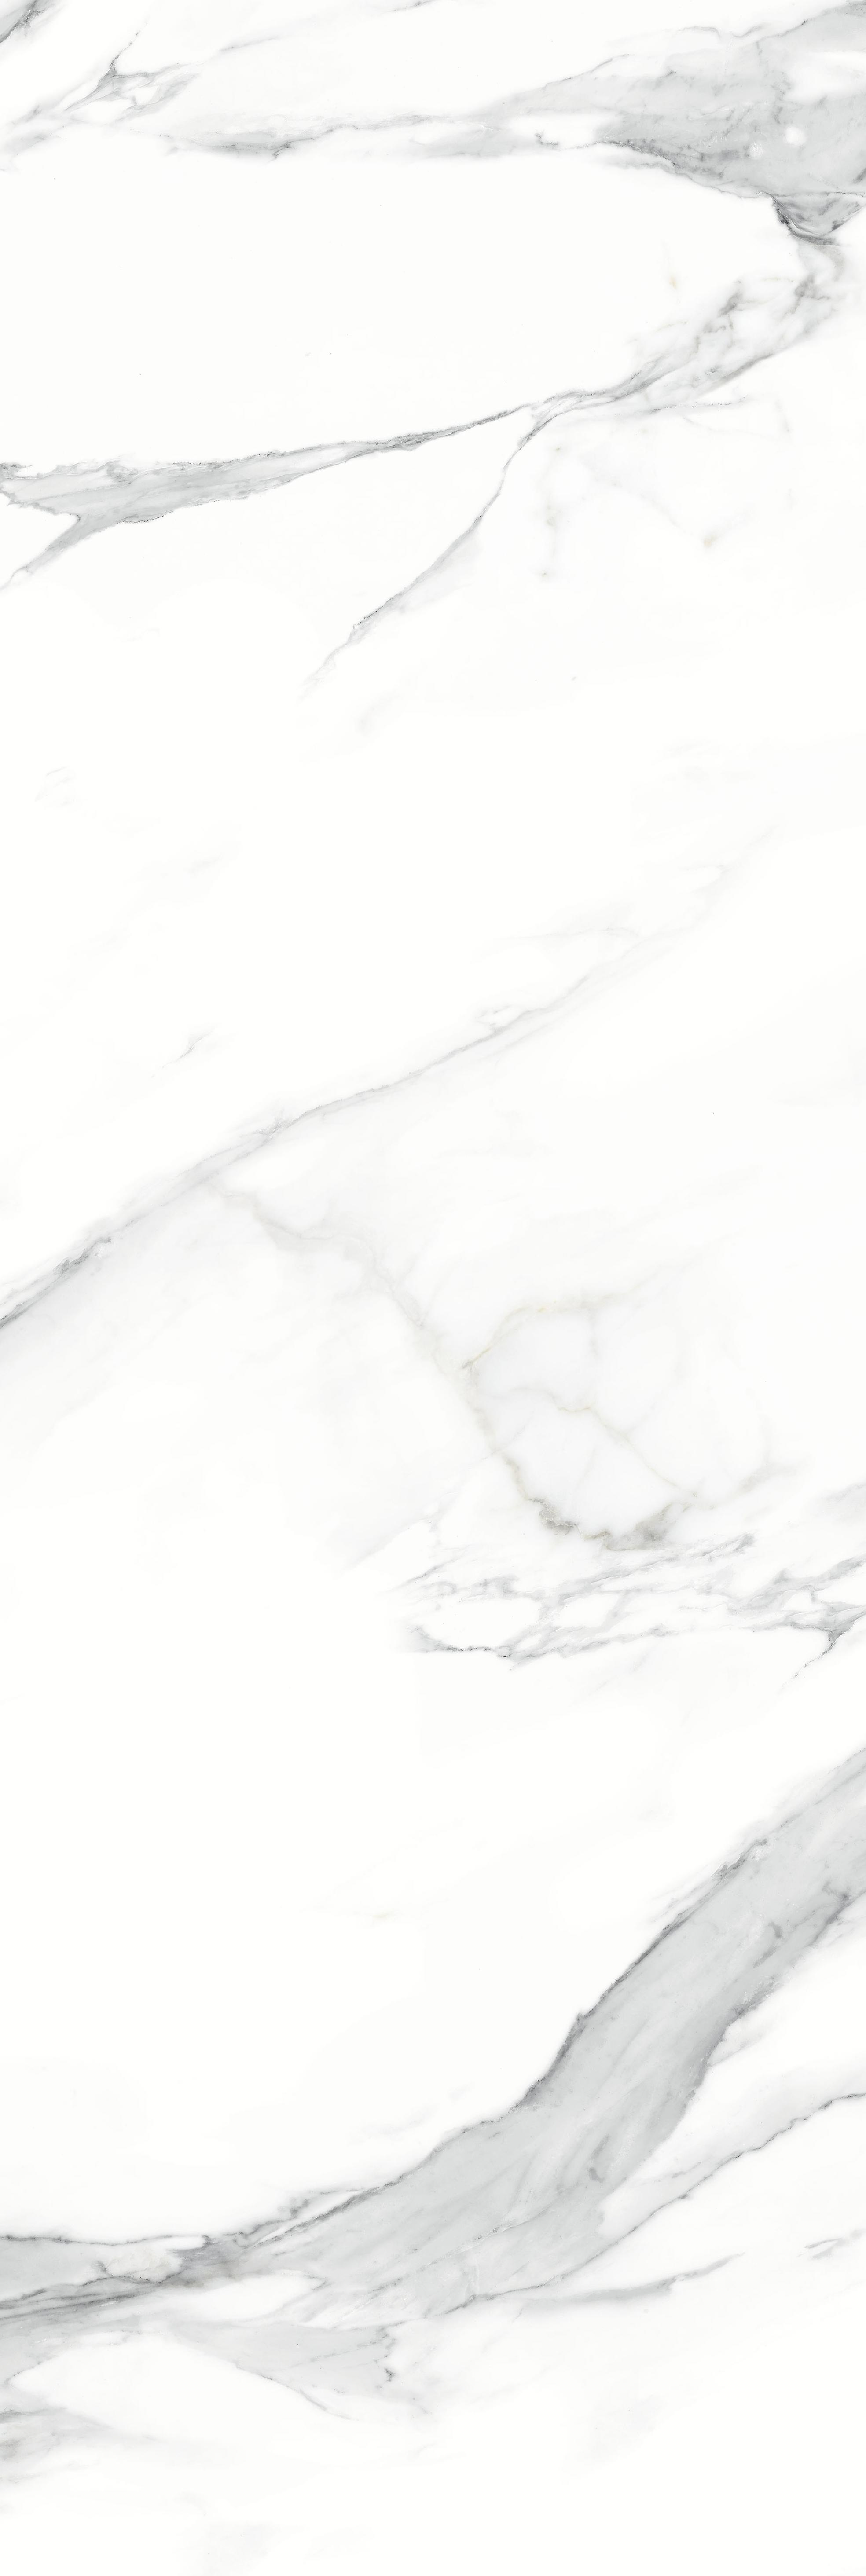 HJ260902暮雪白